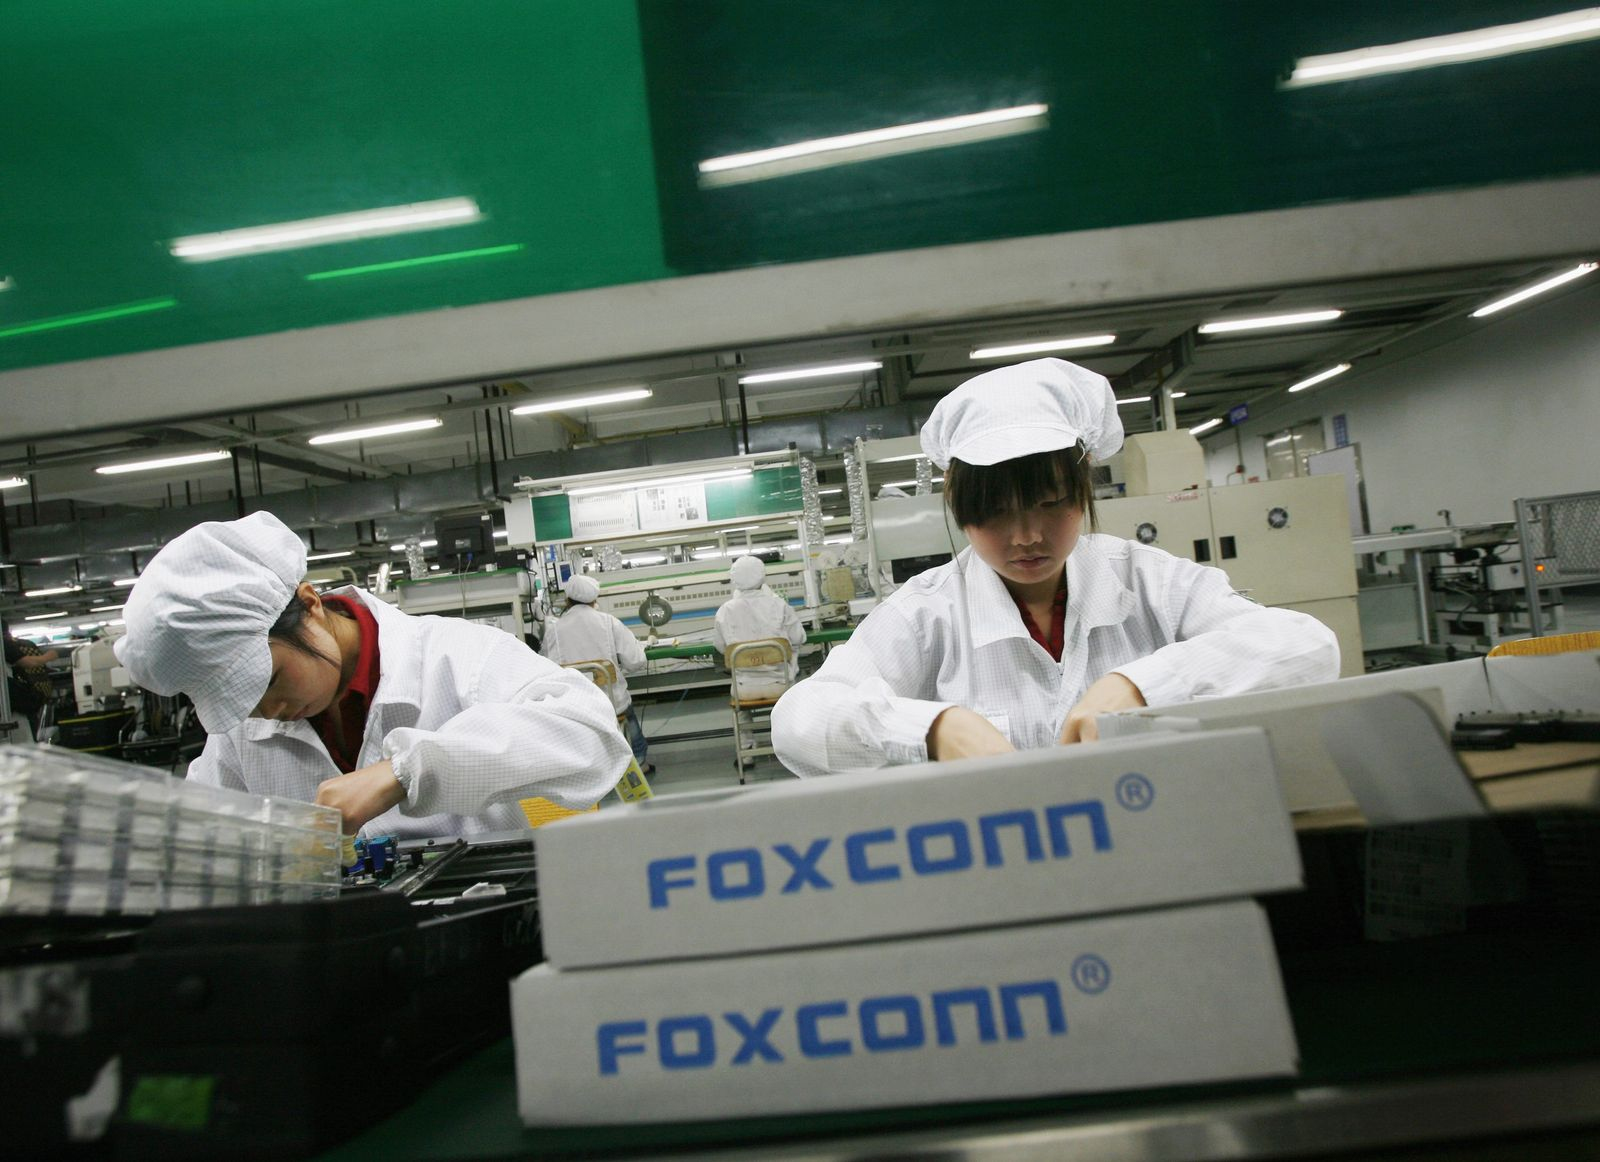 FOXCONN-INDONESIA/